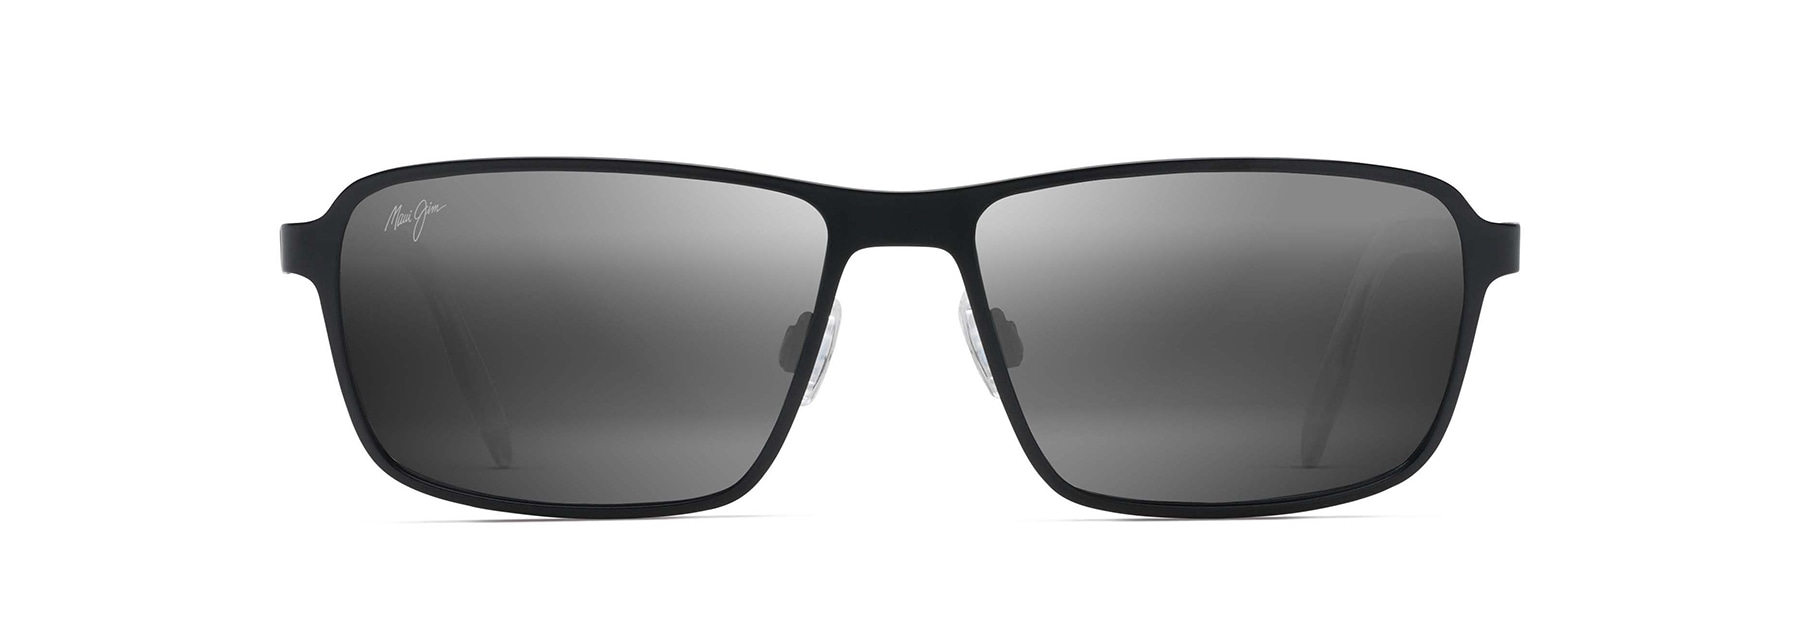 a5e44f789d GLASS BEACH. Polarized Rectangular Sunglasses